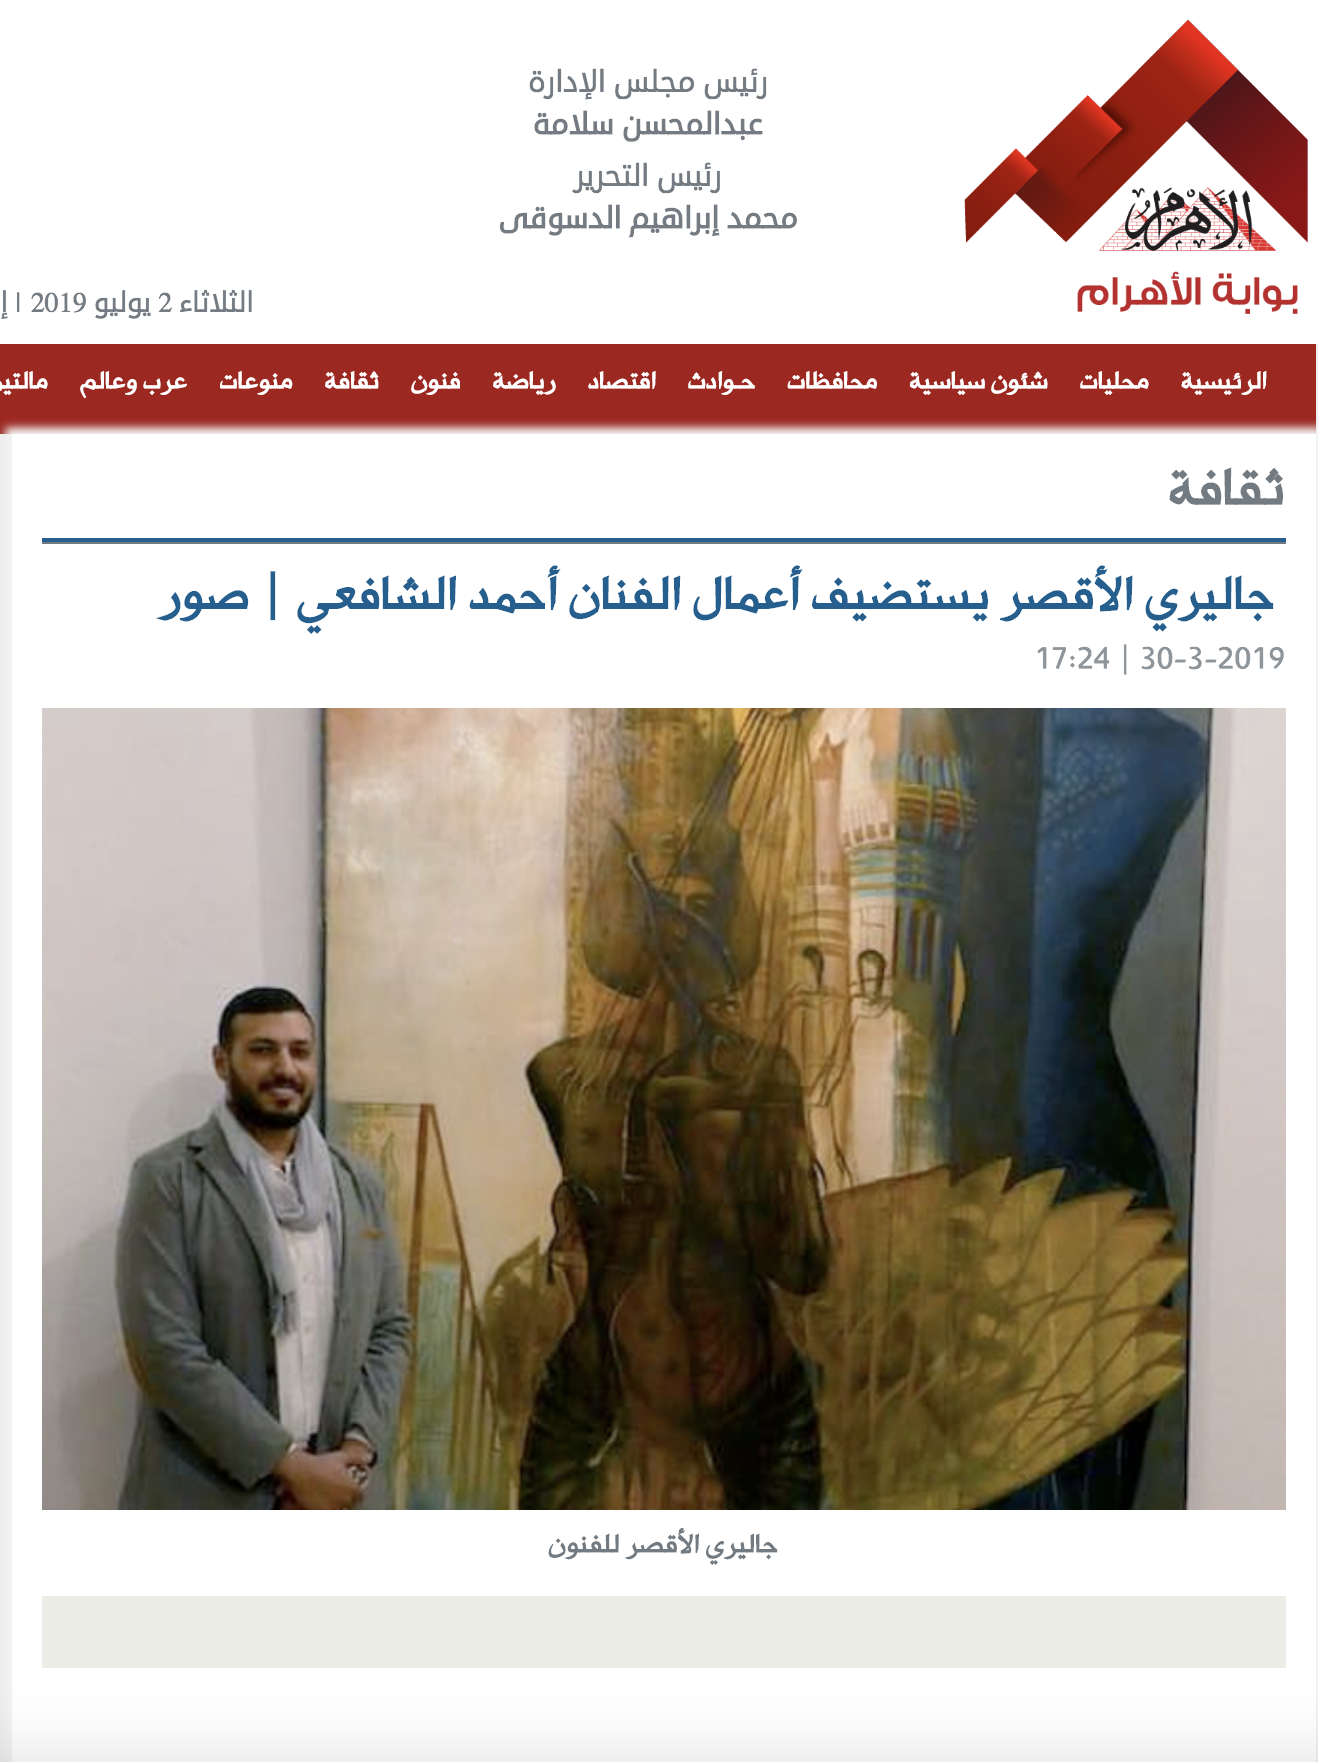 جاليري الأقصر يستضيف أعمال الفنان أحمد الشافعي | صور - http://gate.ahram.org.eg/News/2136994.aspx?fbclid=IwAR09AdpJit6Wwnbmio68Ls_uCWL80iYAoUif_aoqoI0ievuzntT0L-riWhA